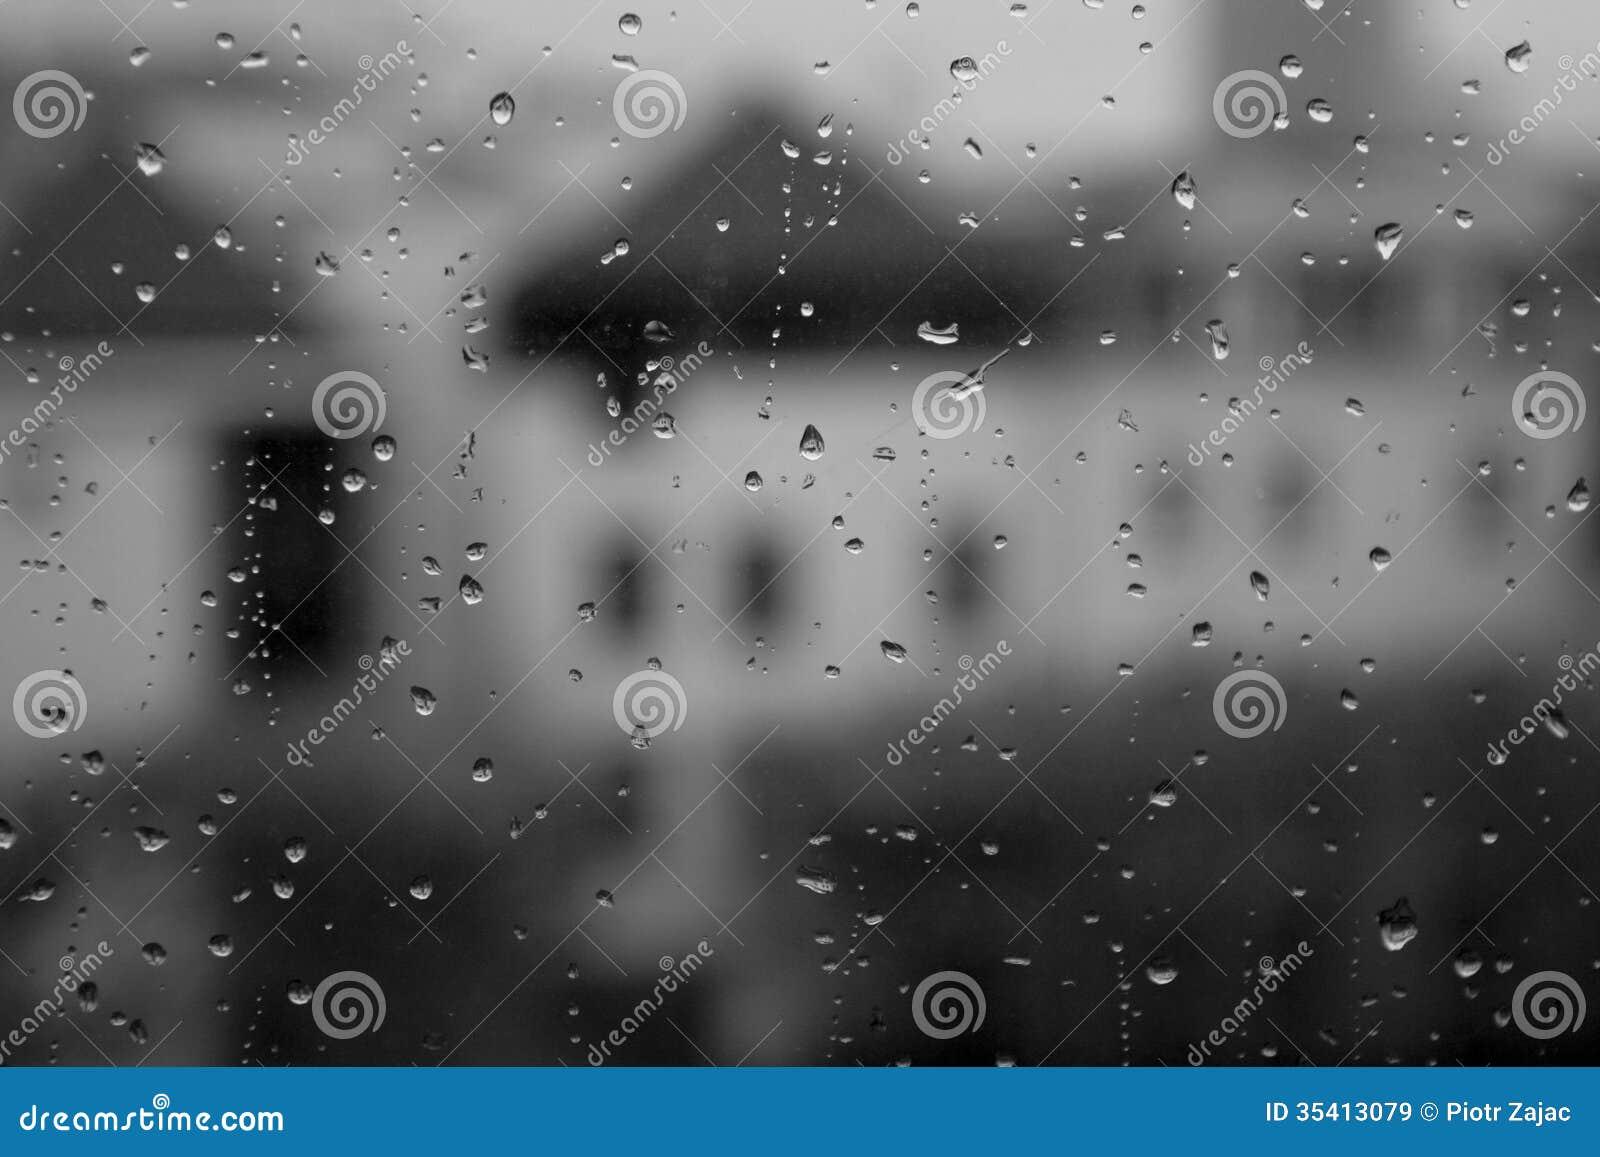 Single raindrop